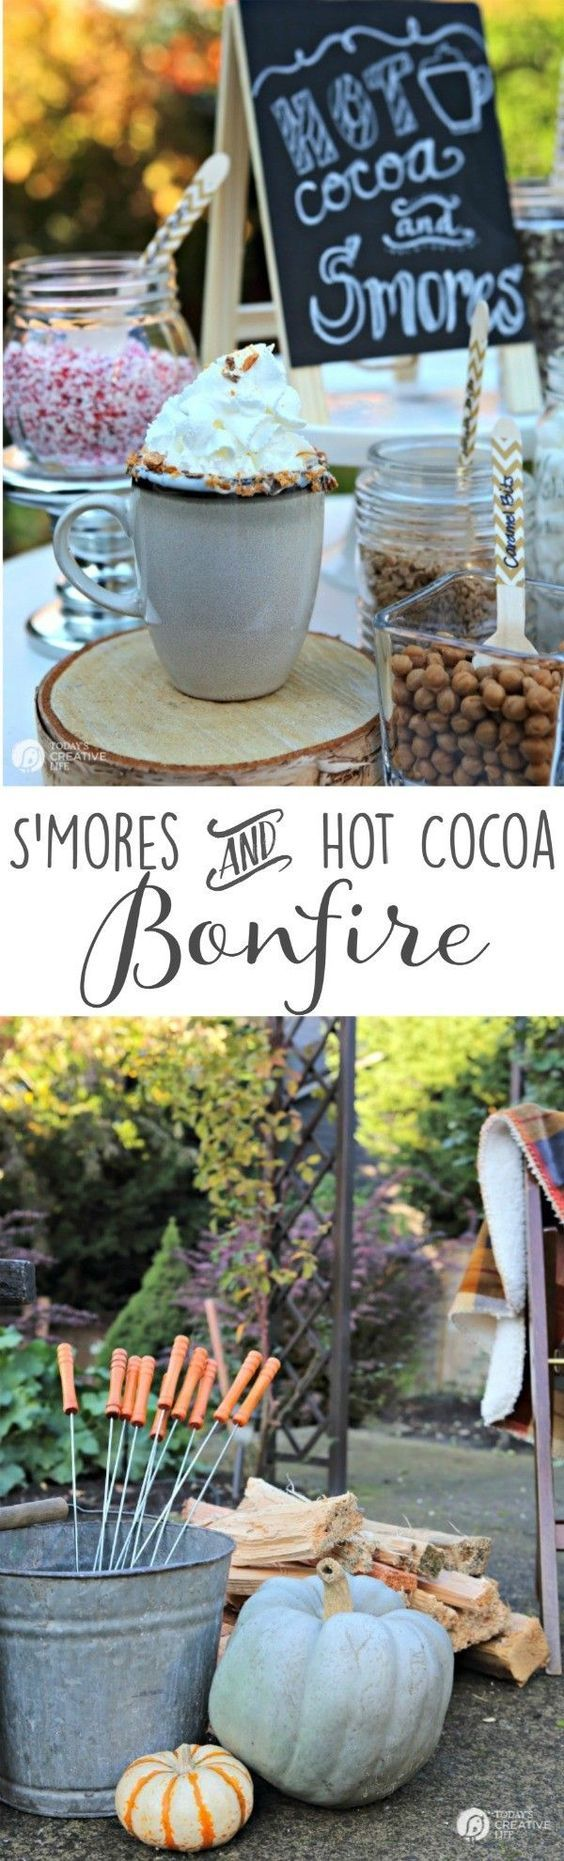 best 25 backyard bonfire party ideas on pinterest bonfire ideas bonfire birthday party and. Black Bedroom Furniture Sets. Home Design Ideas